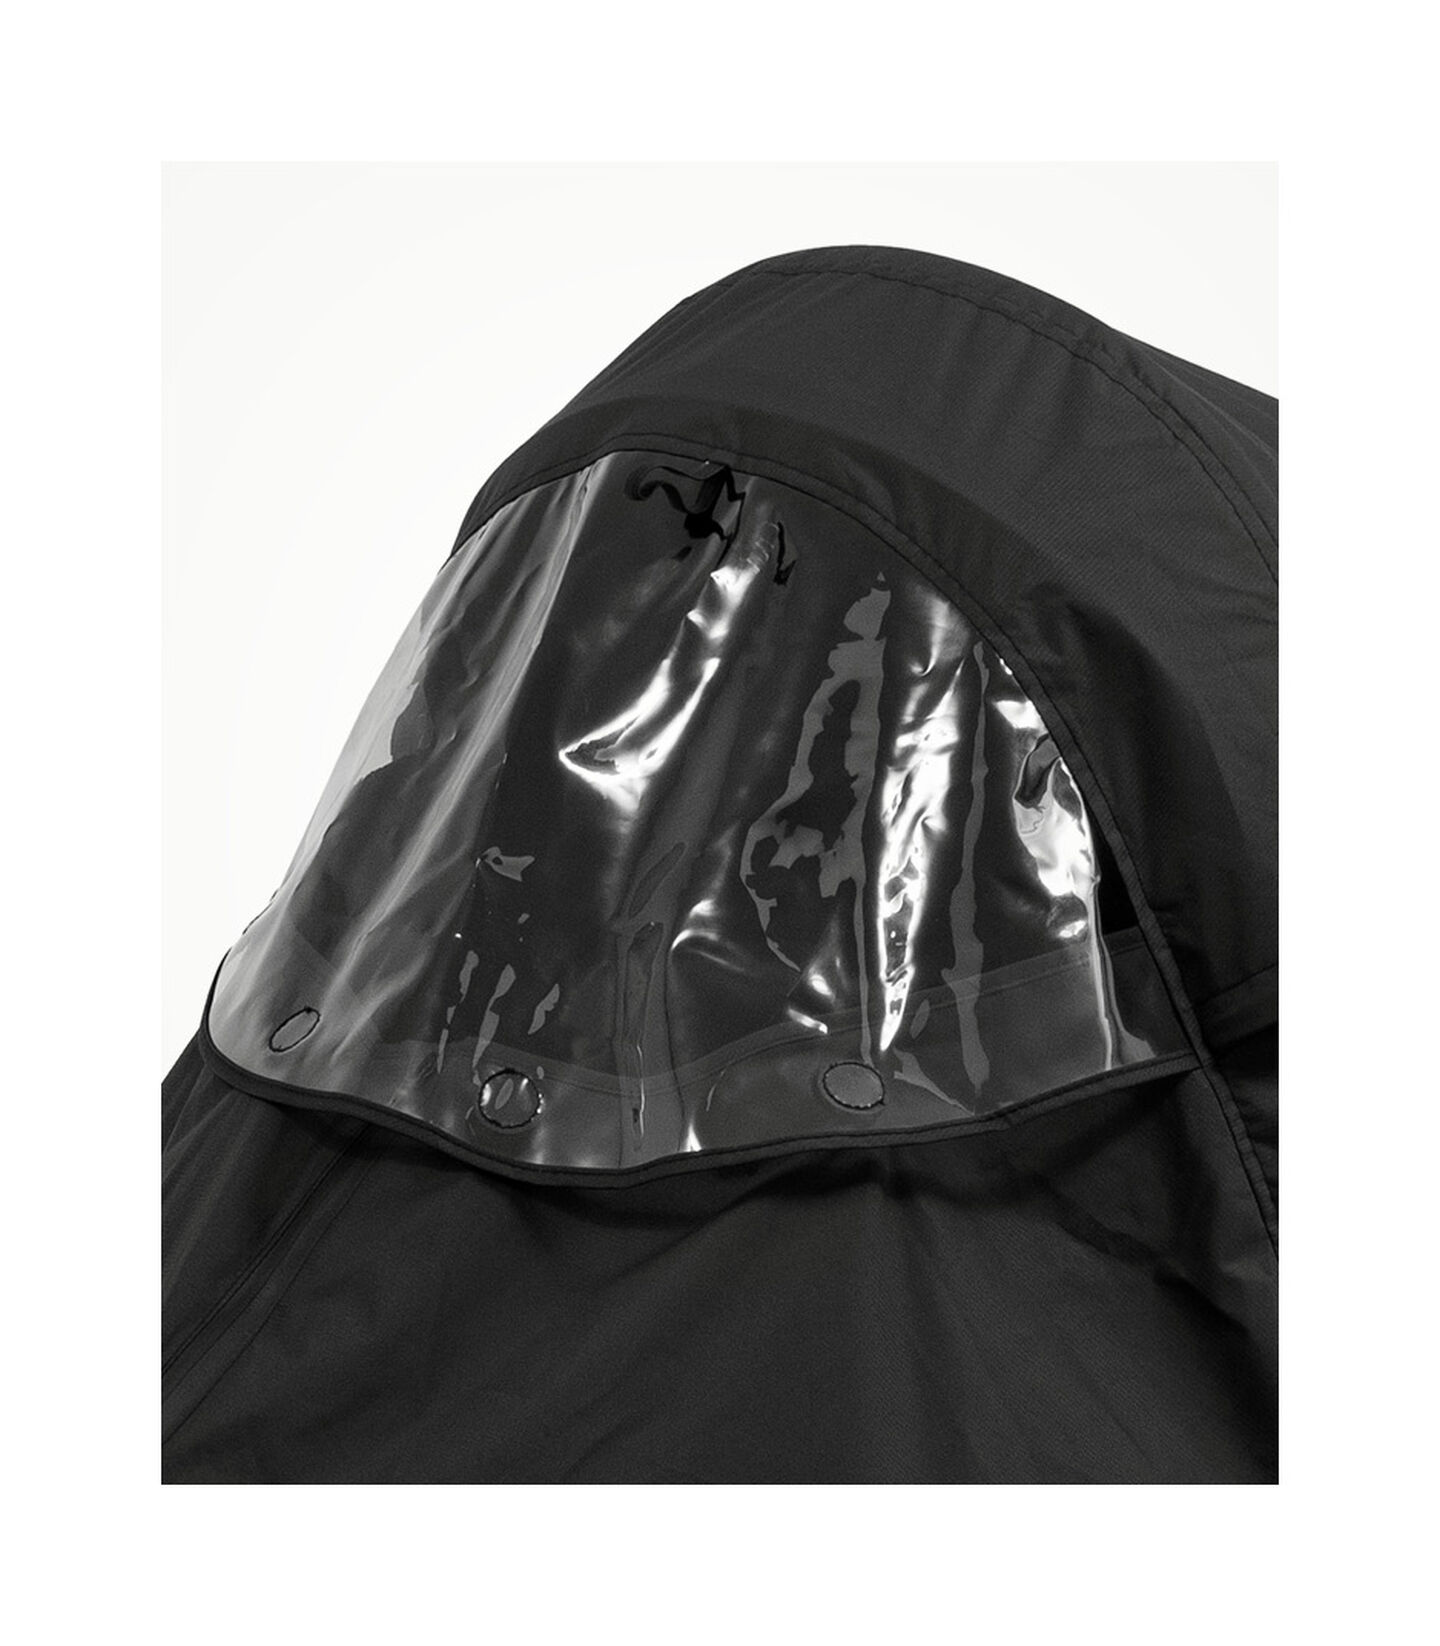 Stokke® Xplory® X Regenschutz Black, Black, mainview view 4